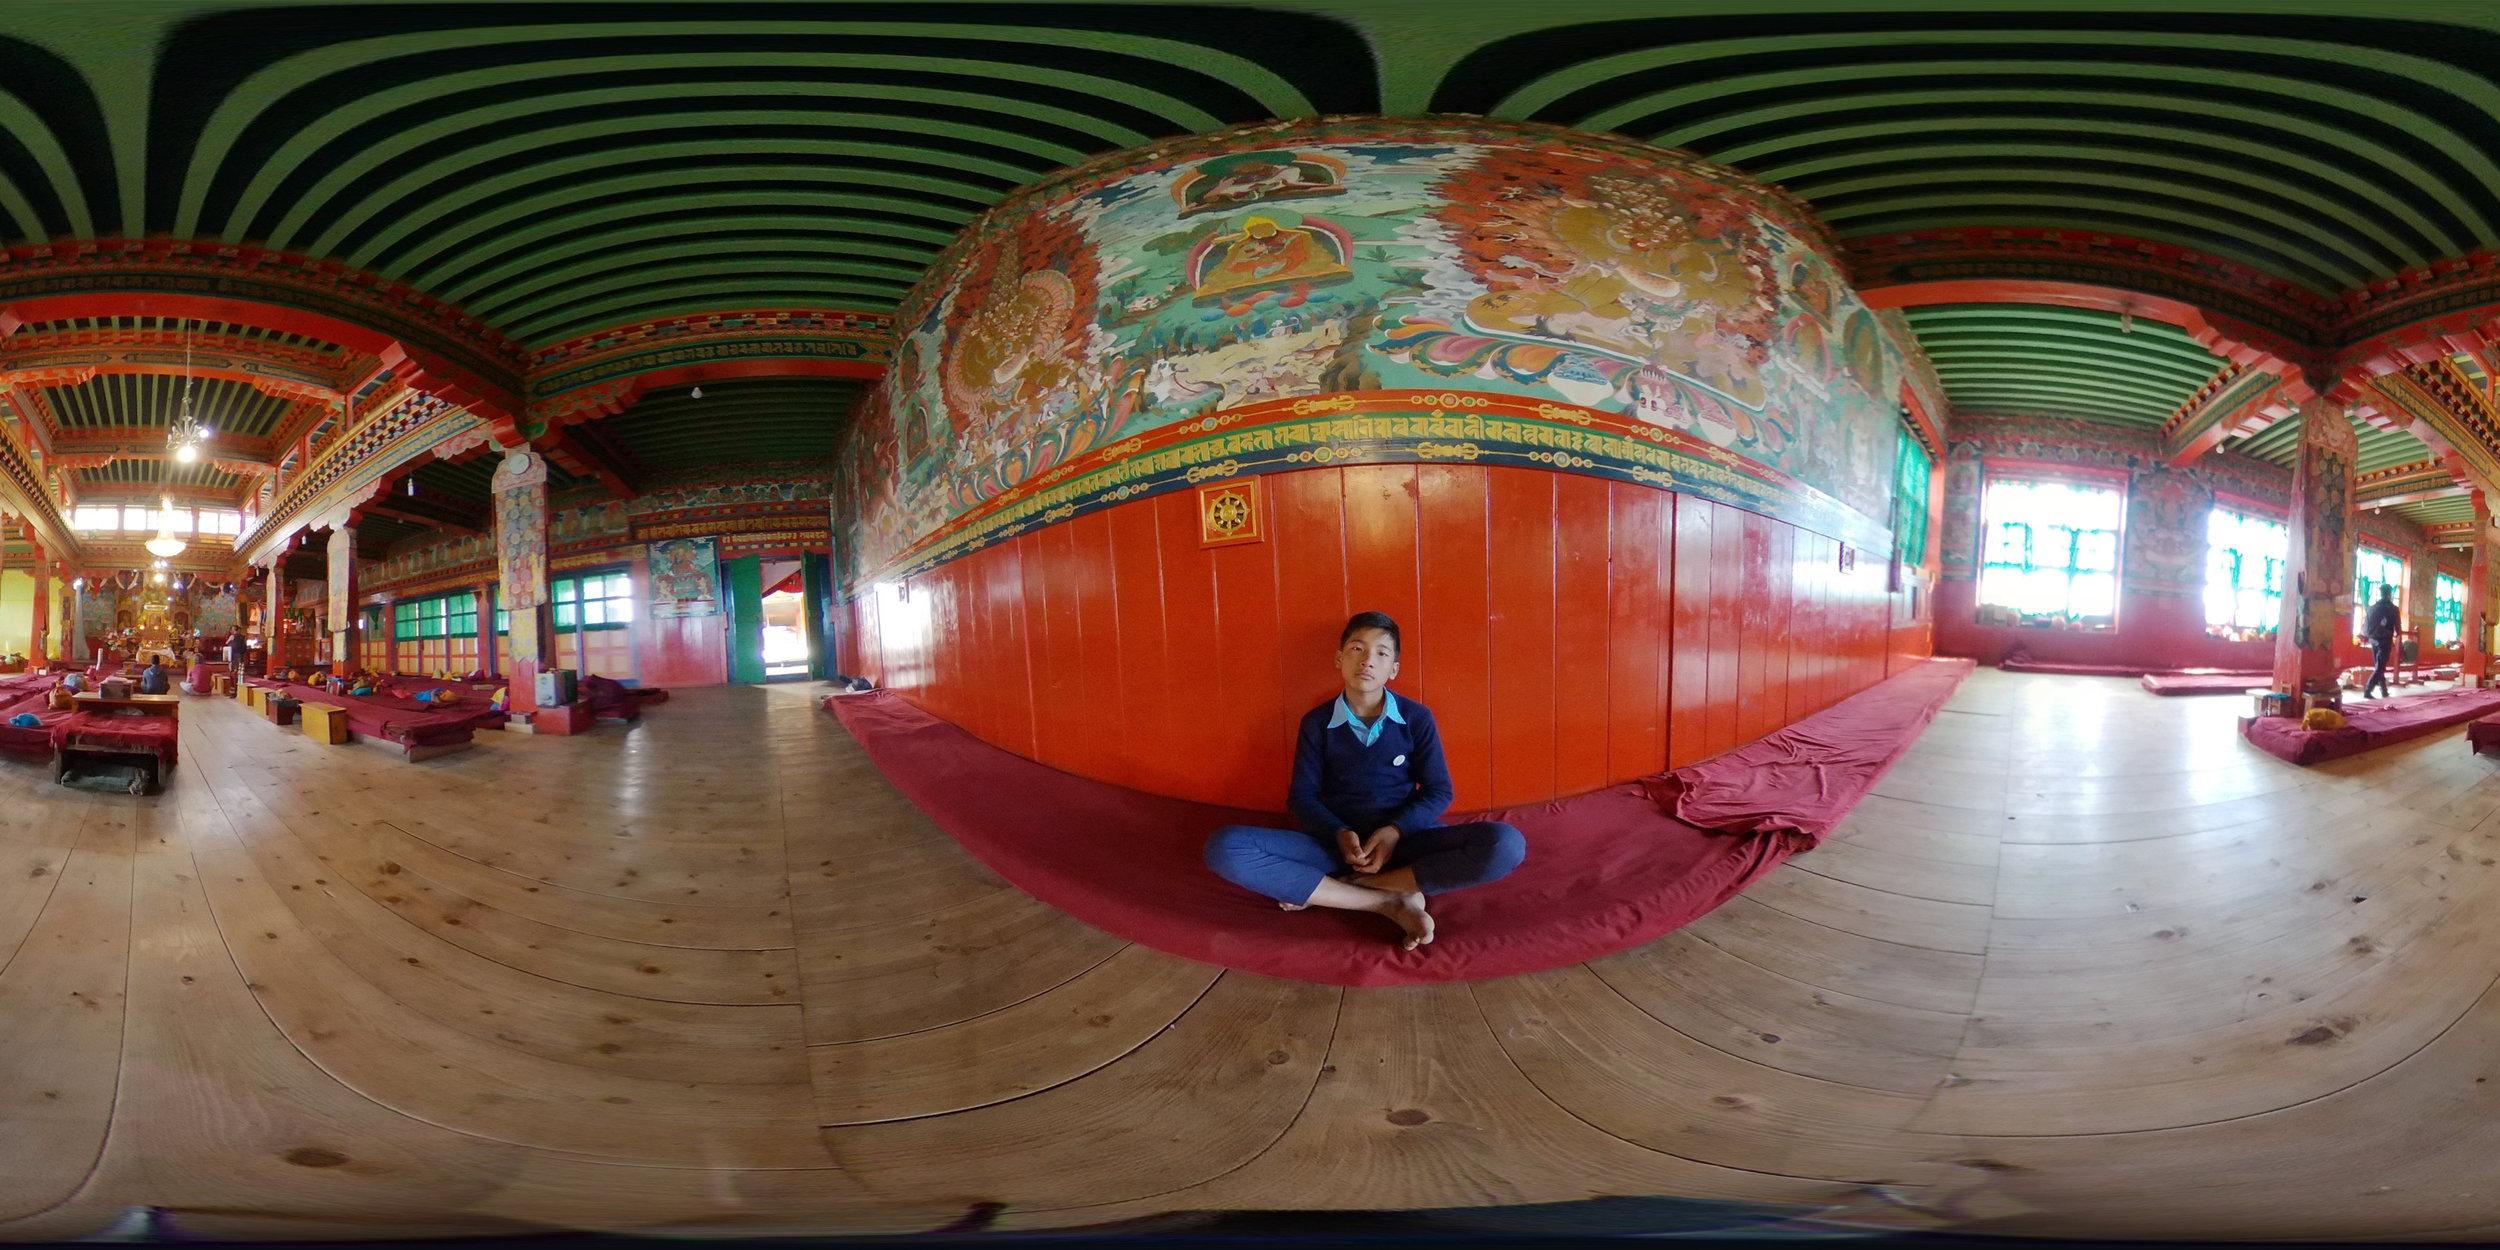 Thupten Choling Monastery